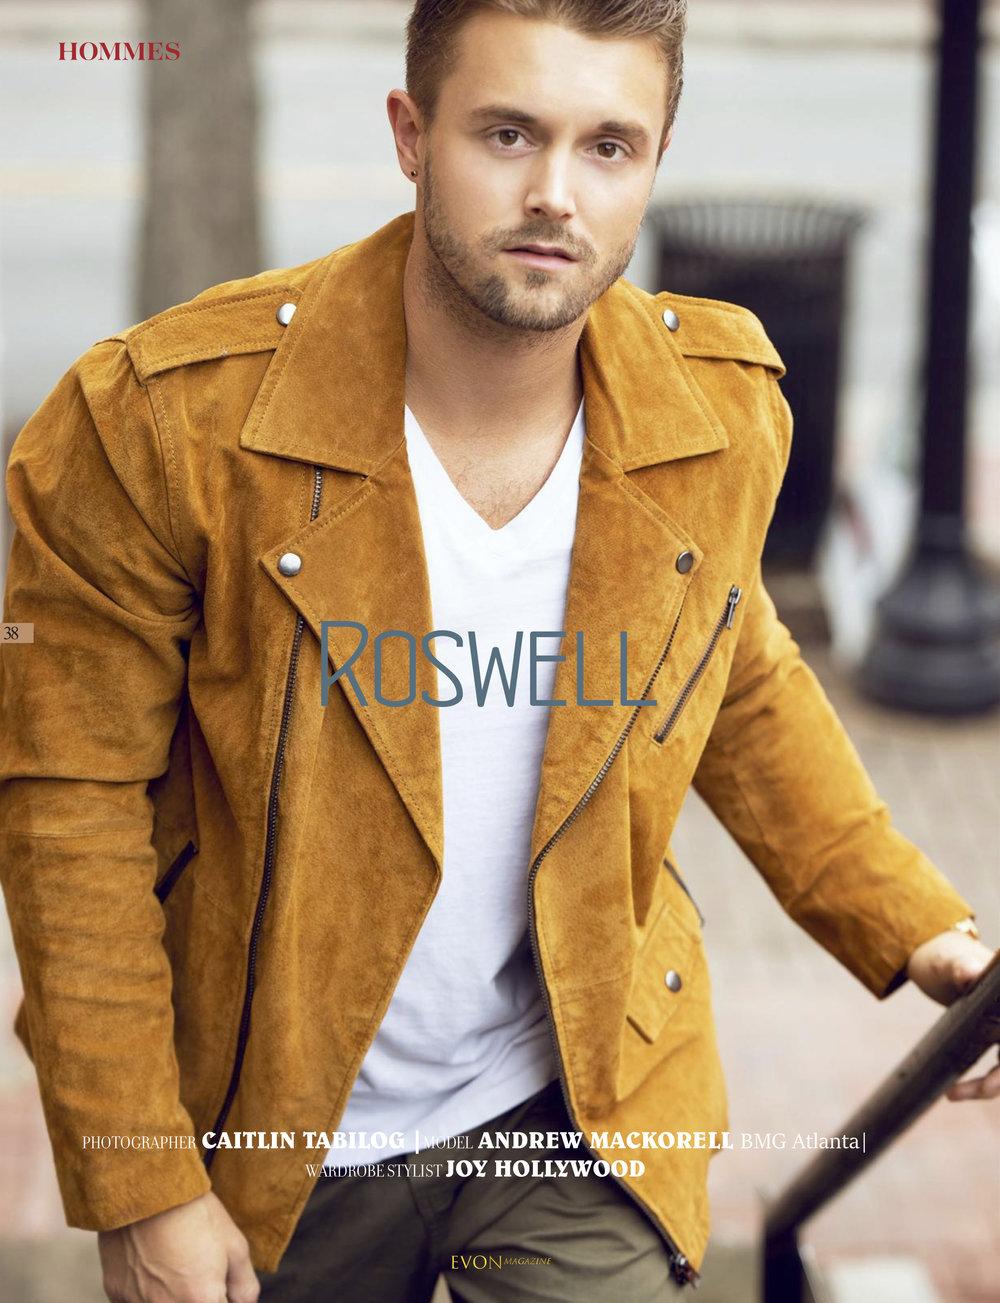 """Roswell"" Published in Evon Magazine  Model: Andrew Mackorell  Agency: BMG Atlanta  Stylist: Joy Hollywood"